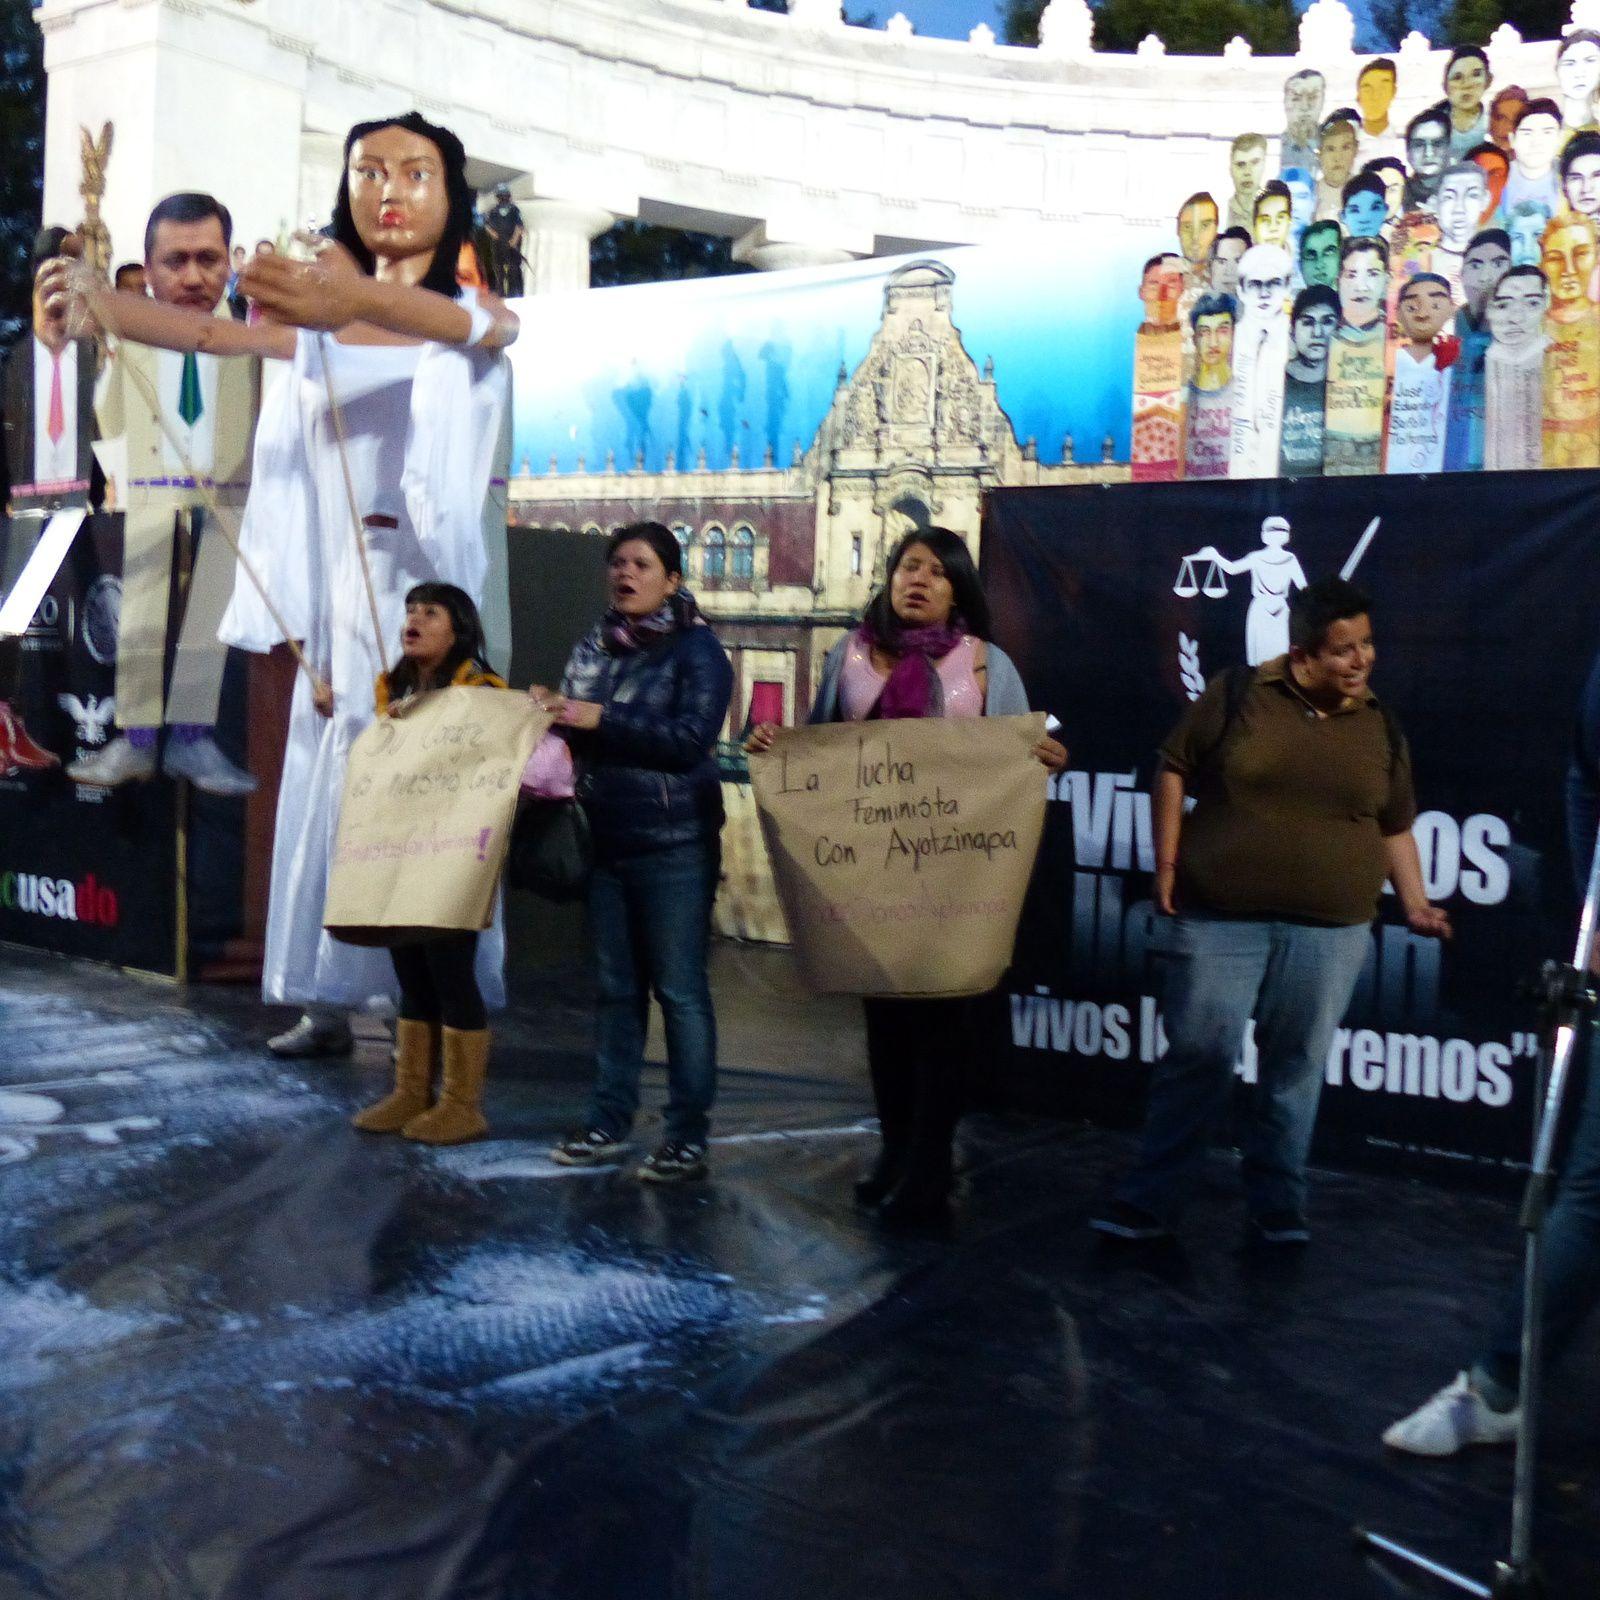 5 novembre 3eme journèe internationale pour Ayotzinapa